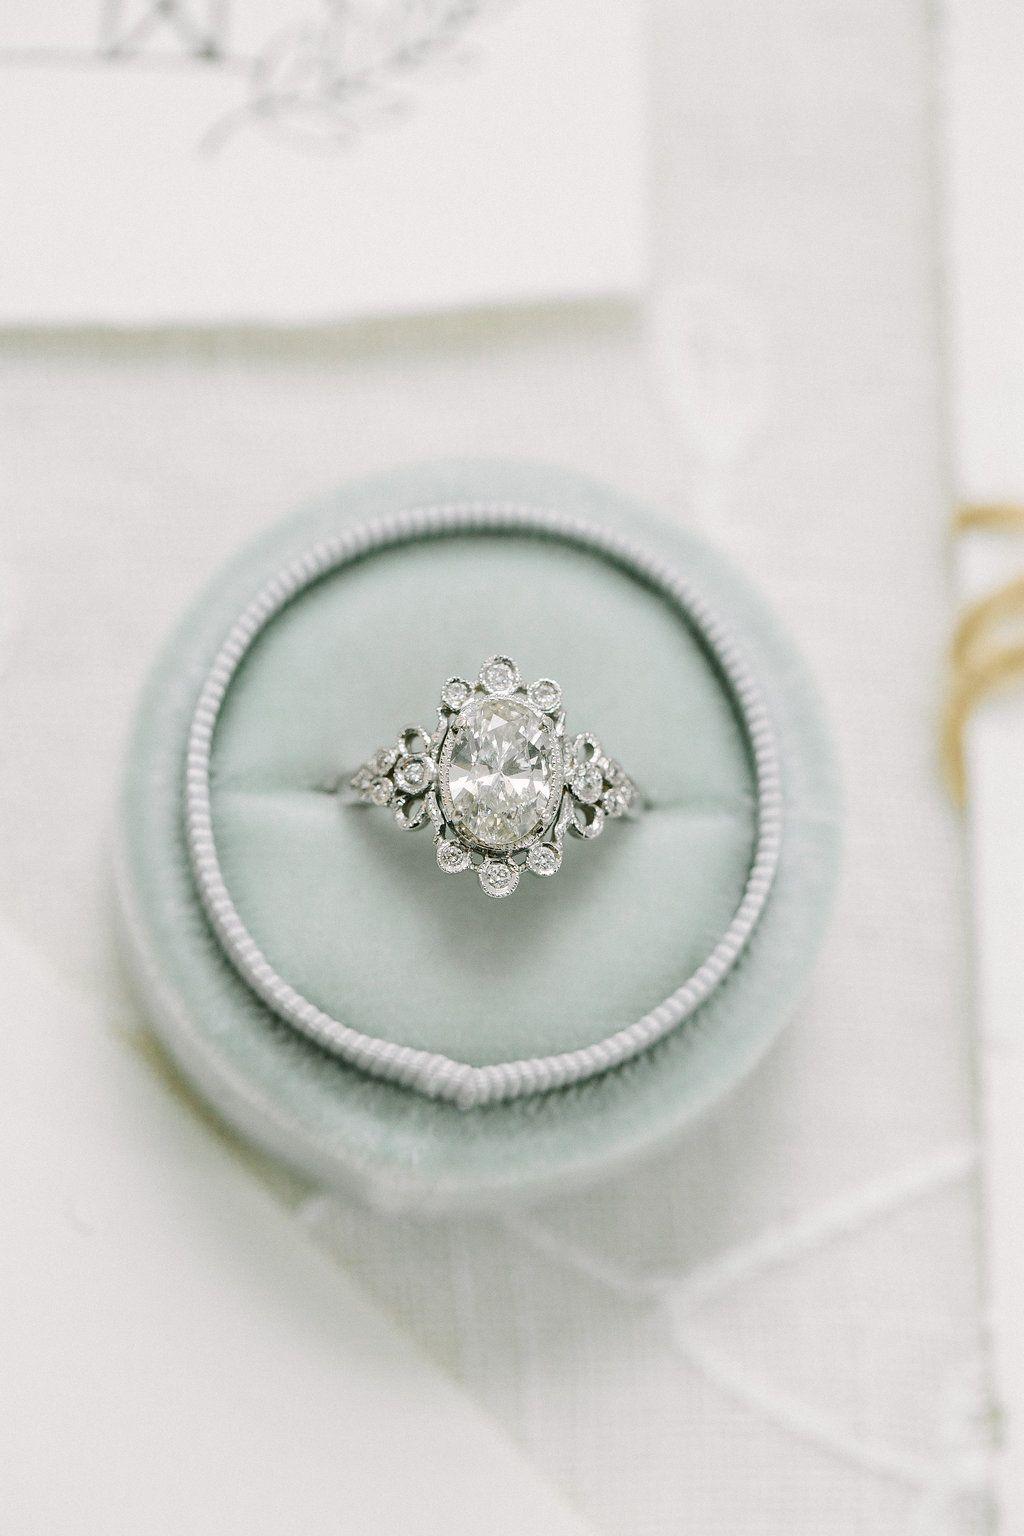 Garden of eden inspired vintage wedding ring ending in a real